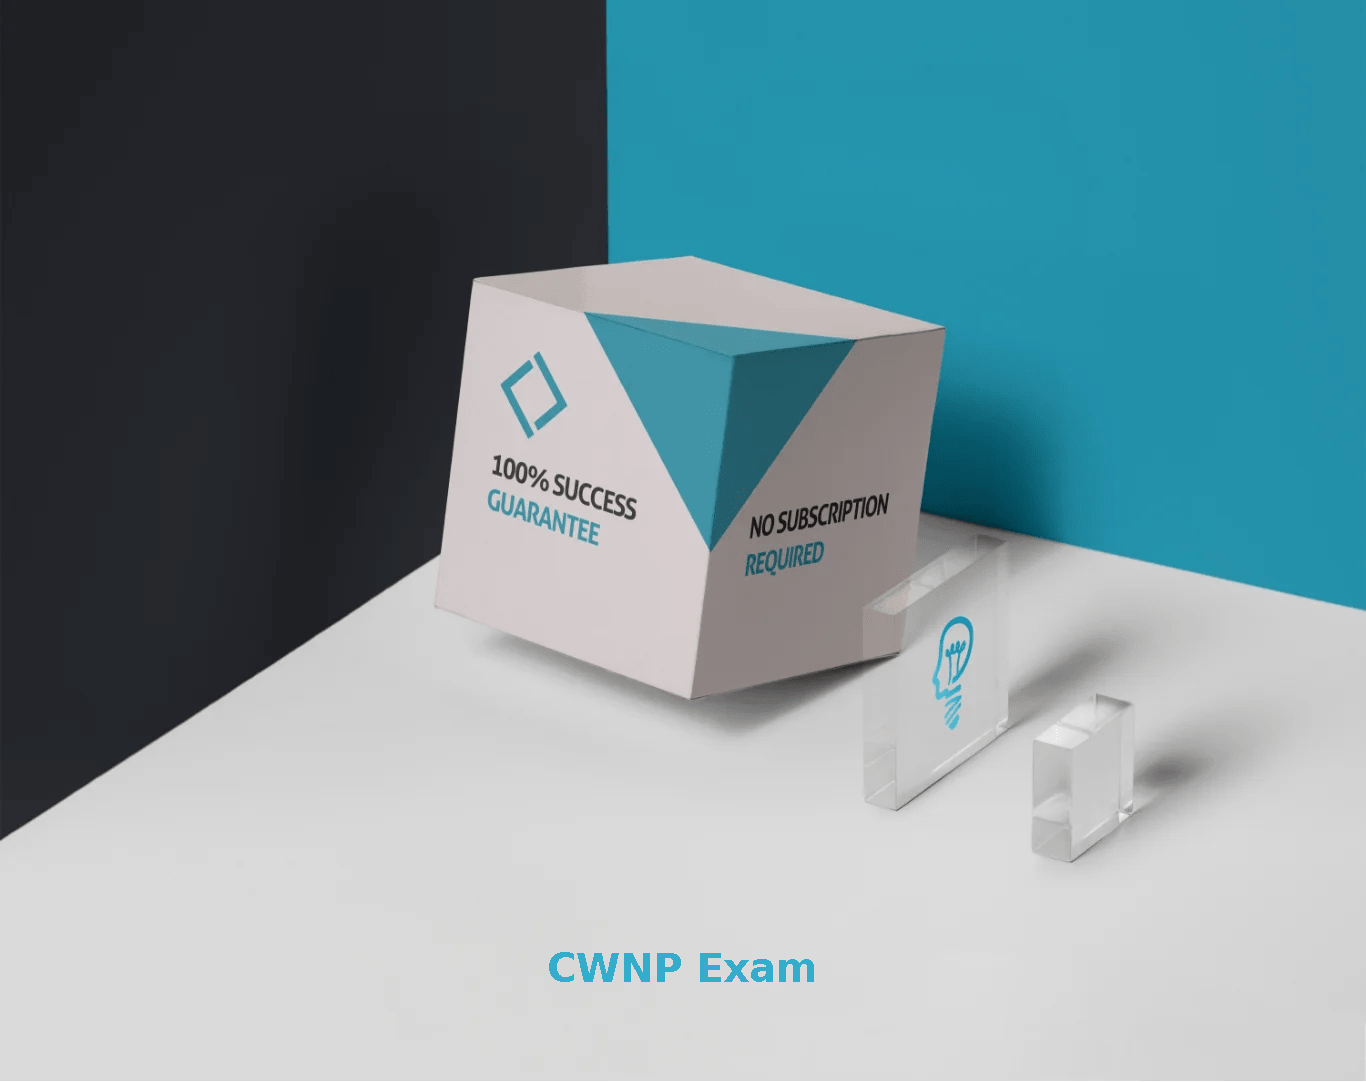 CWNP Exam Dumps